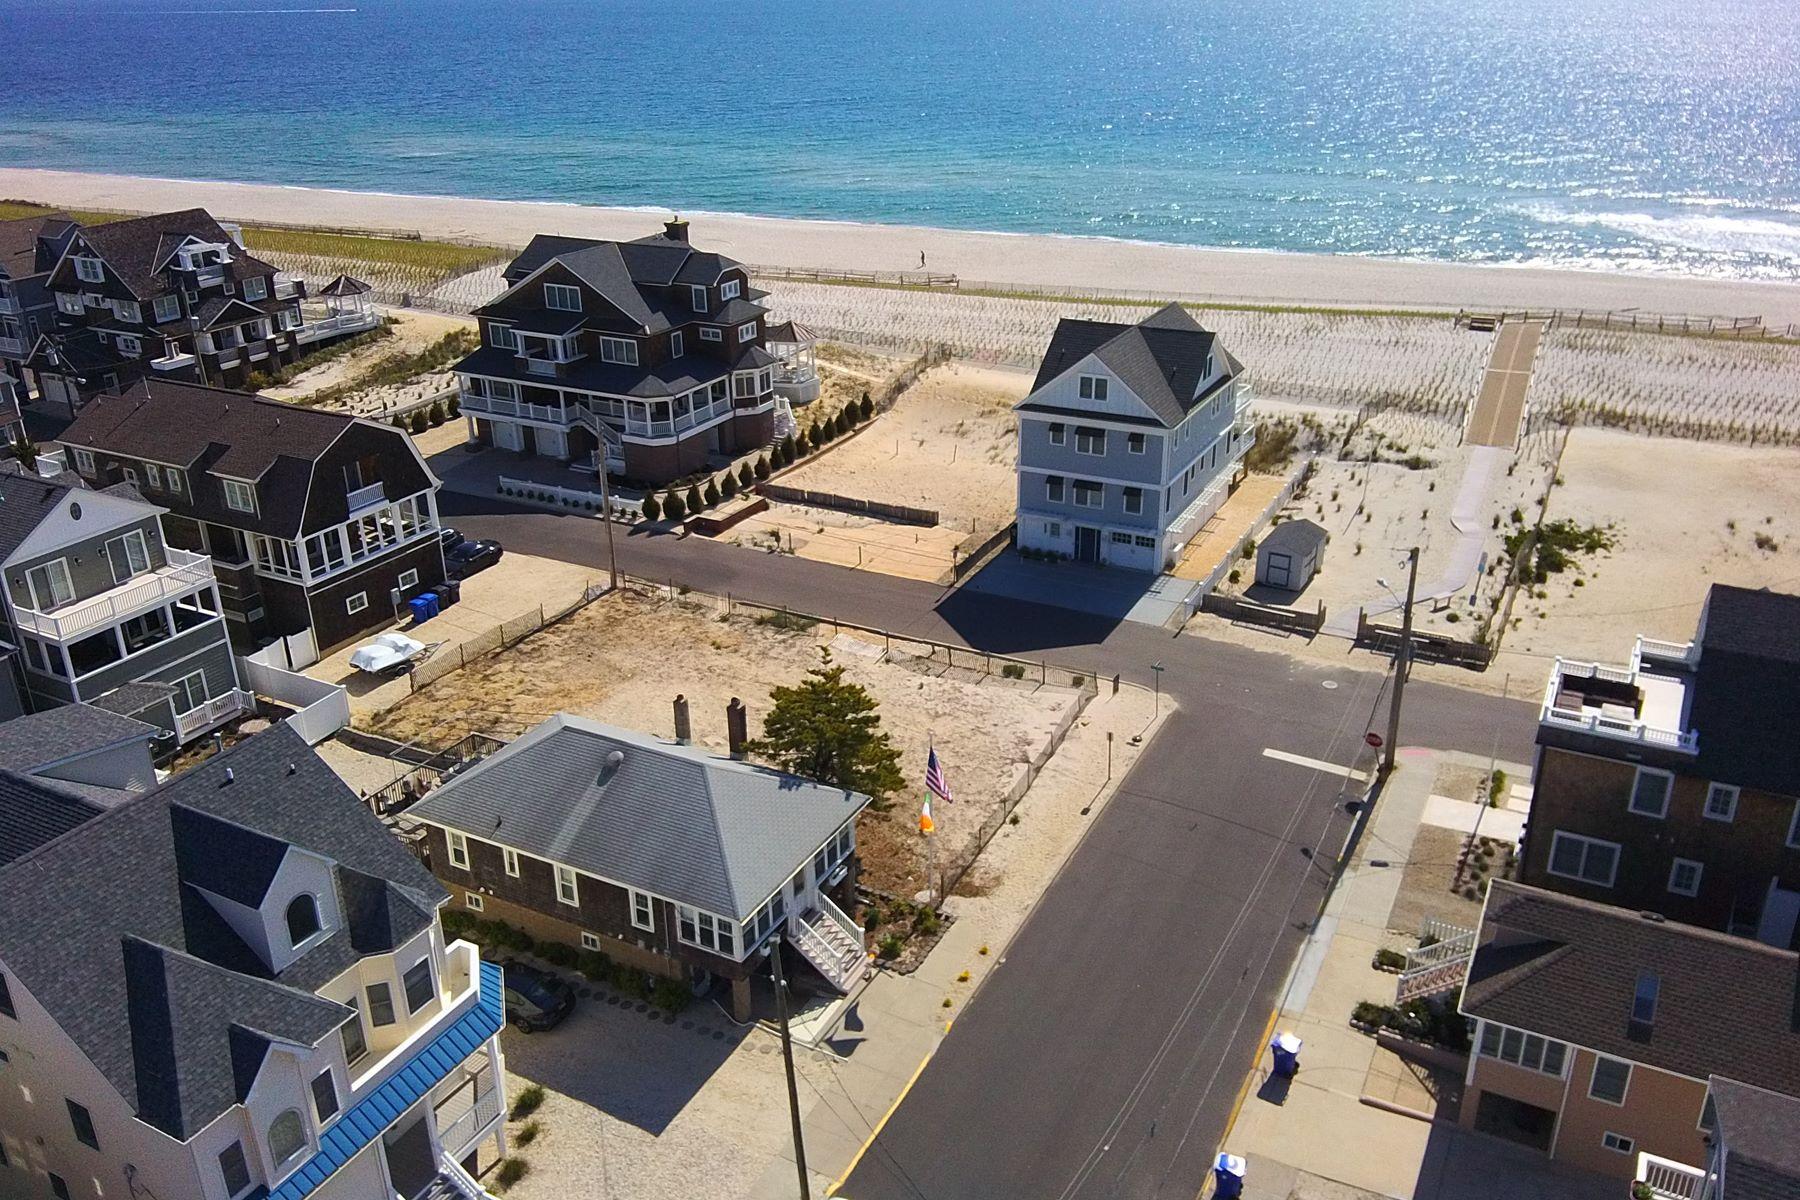 Property 为 销售 在 Residential Lot Located Across From The Ocean 3665 Ocean Terrace, 诺曼底海滩, 新泽西州 08739 美国